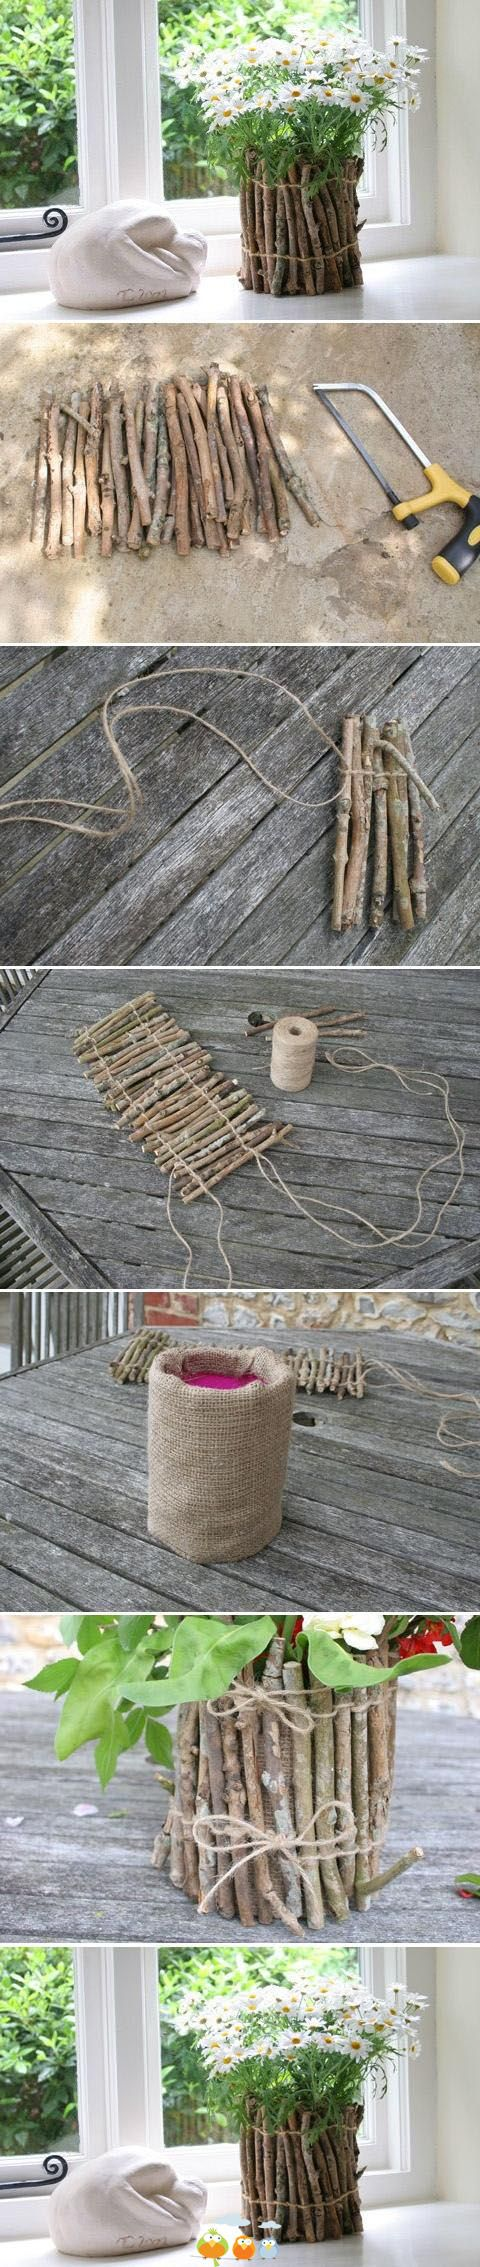 Diy tree branches home decor ideas